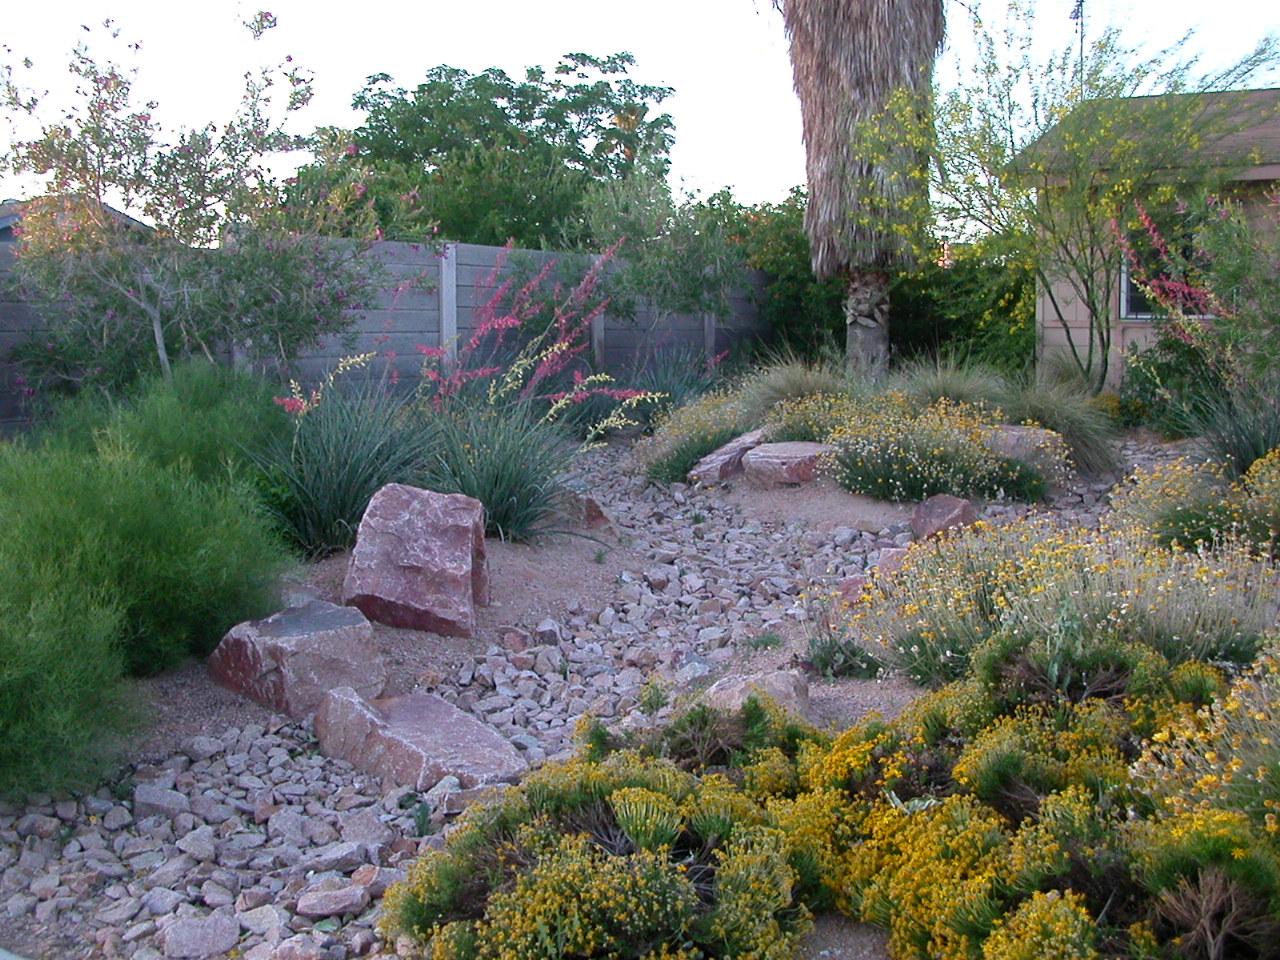 Extreme gardening designing with desert plants for Shrub garden design